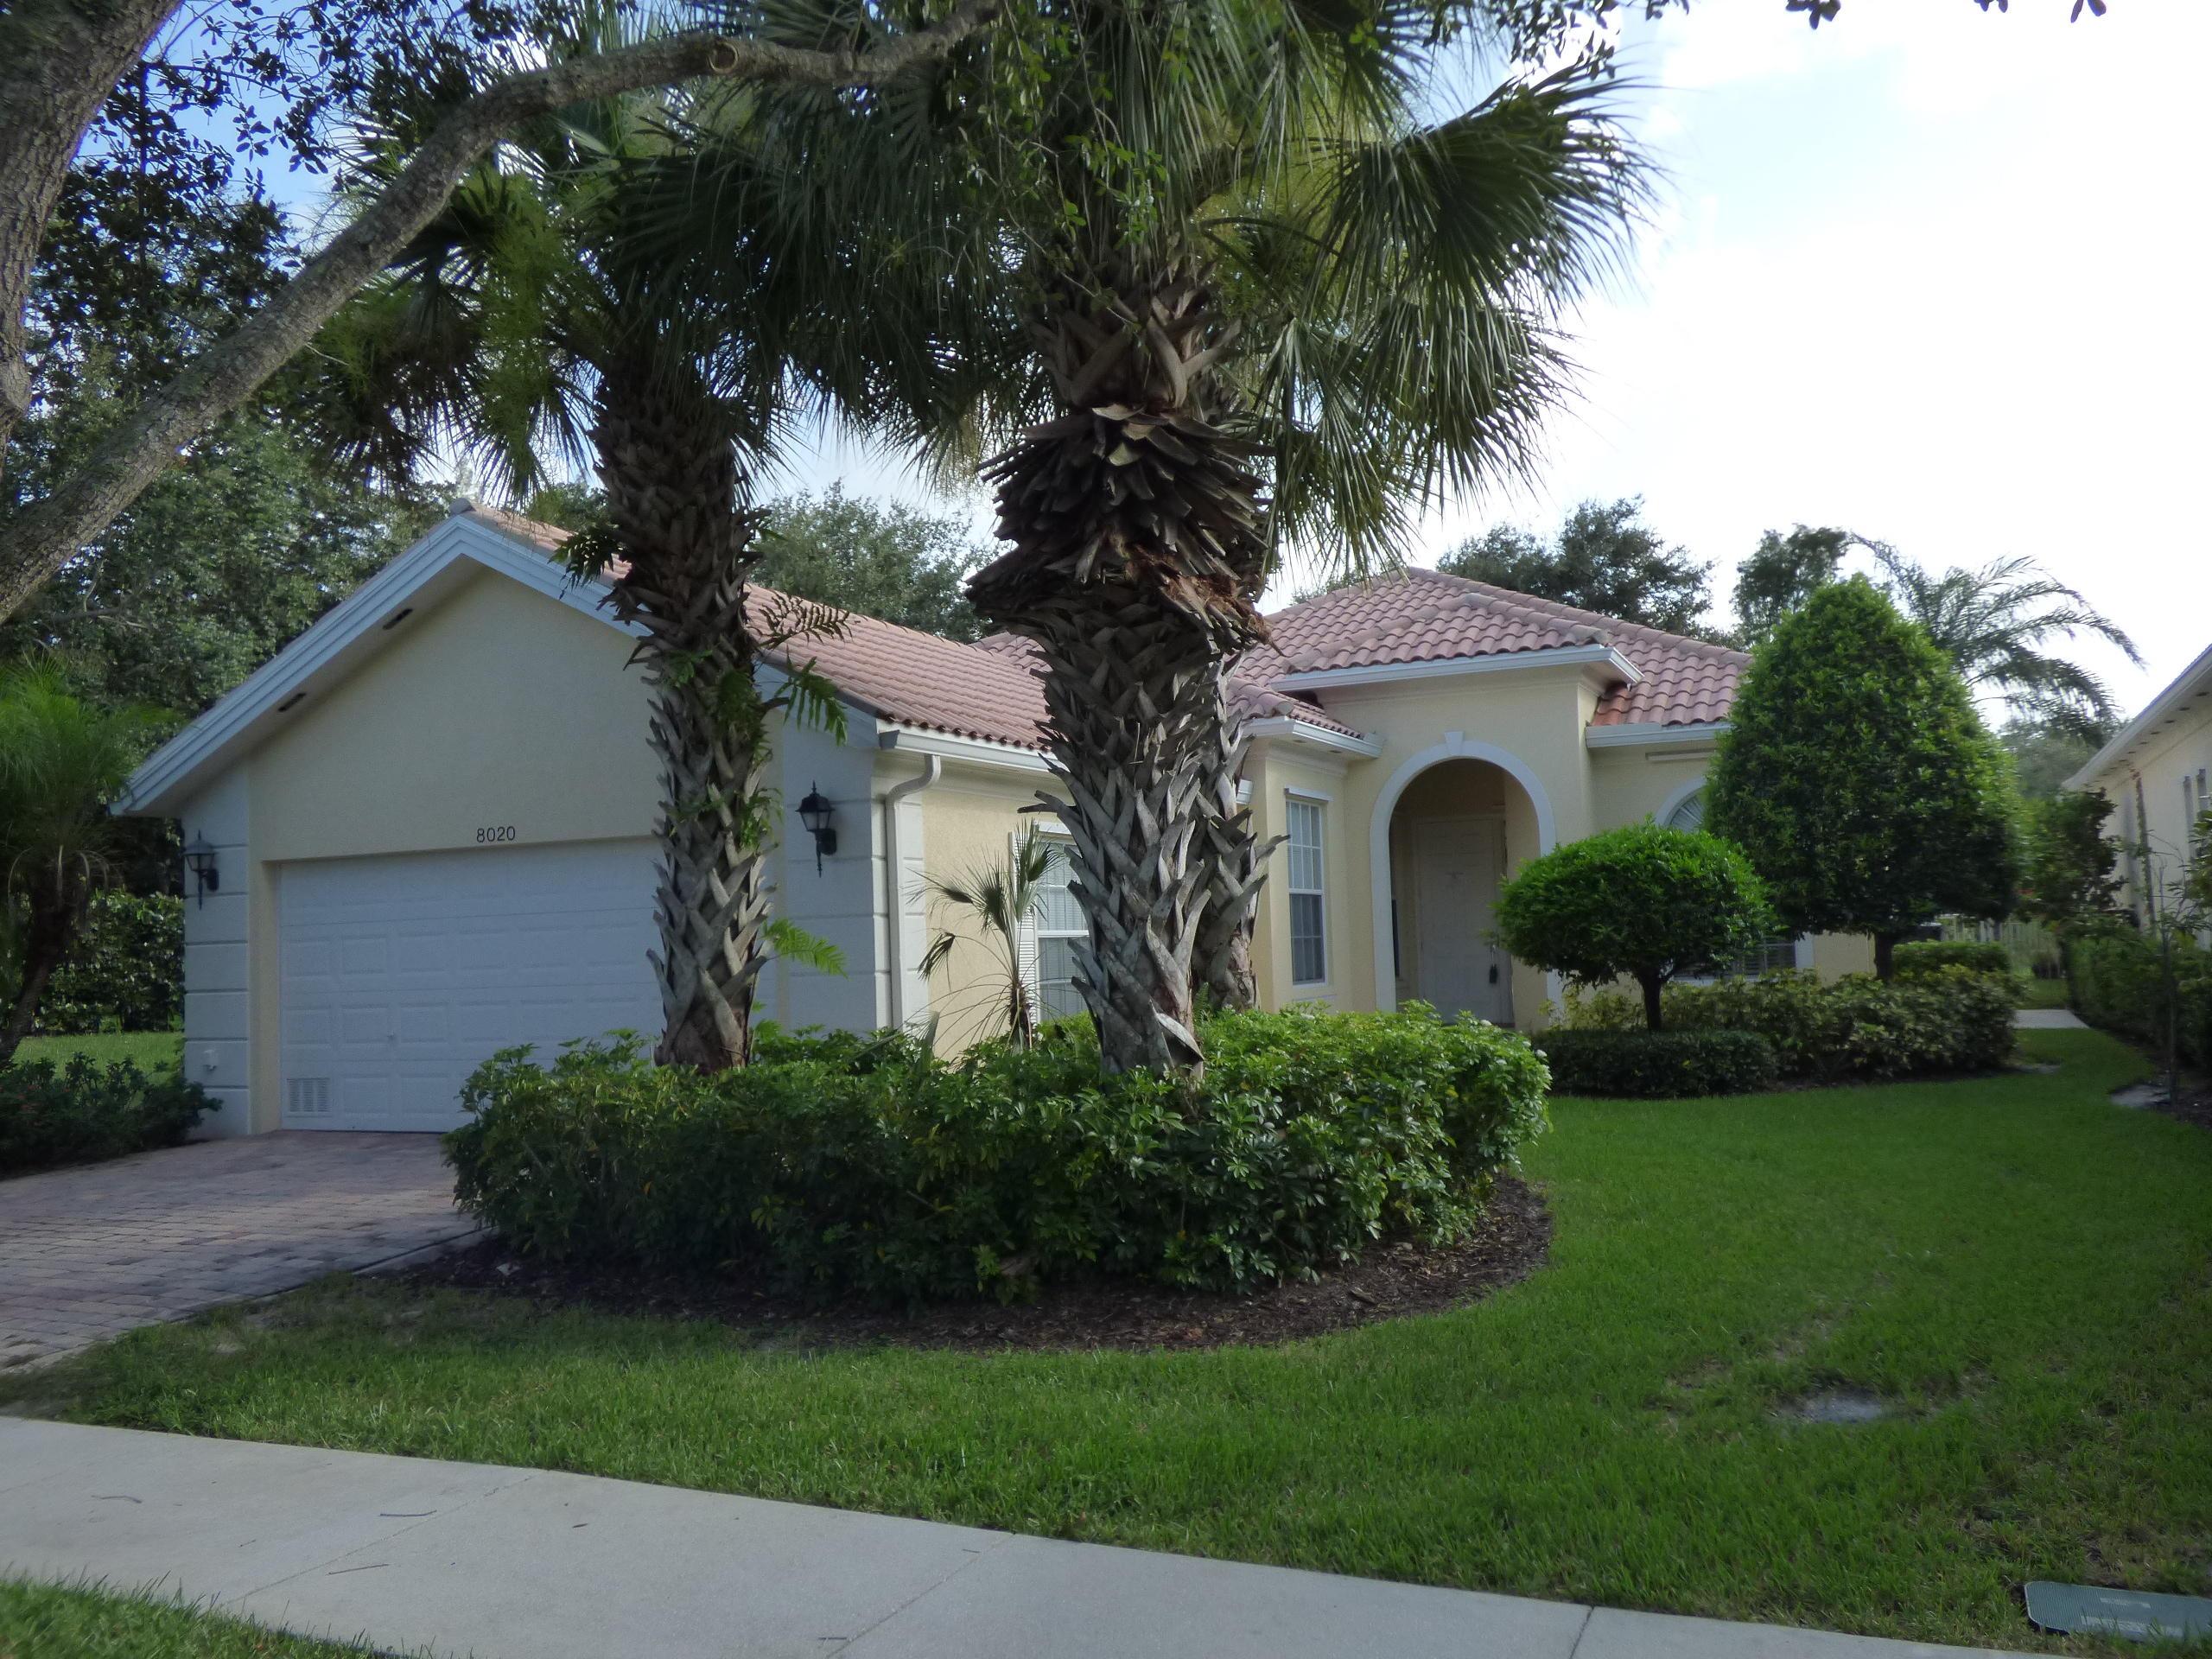 Home for sale in Village Walk of Wellington Wellington Florida